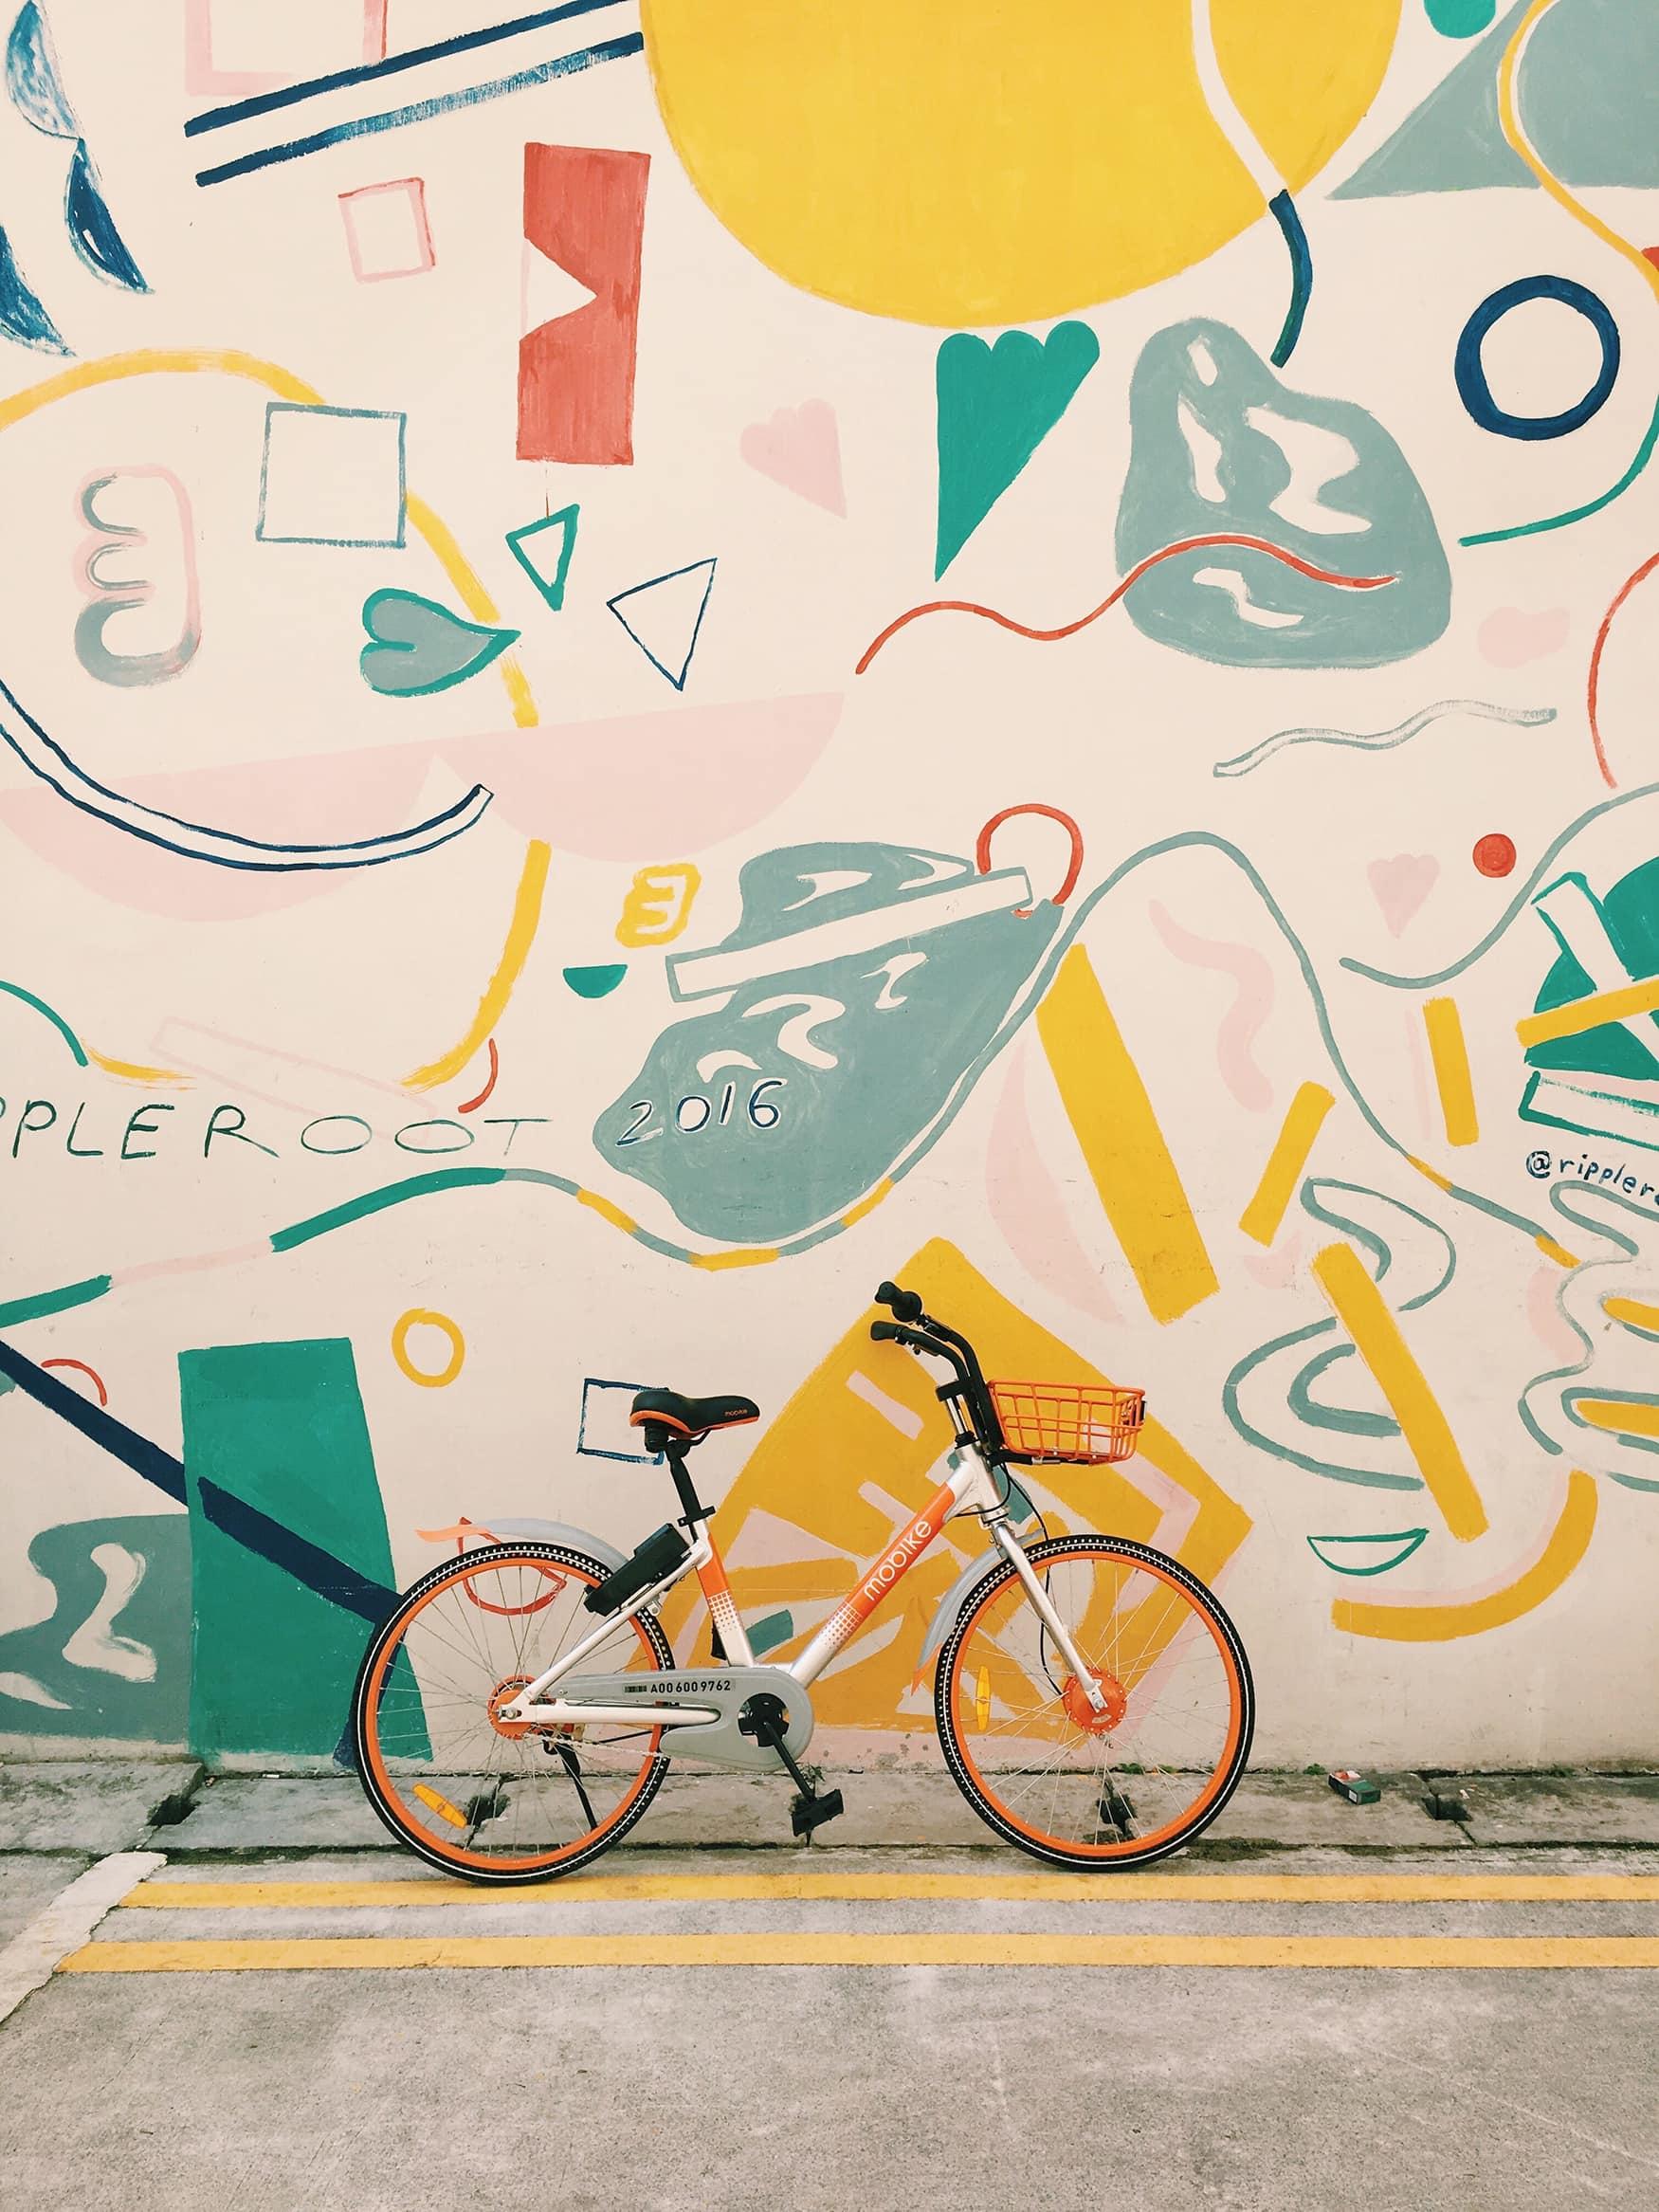 Fahrrad lehnt an bunter Hauswand in Singapur